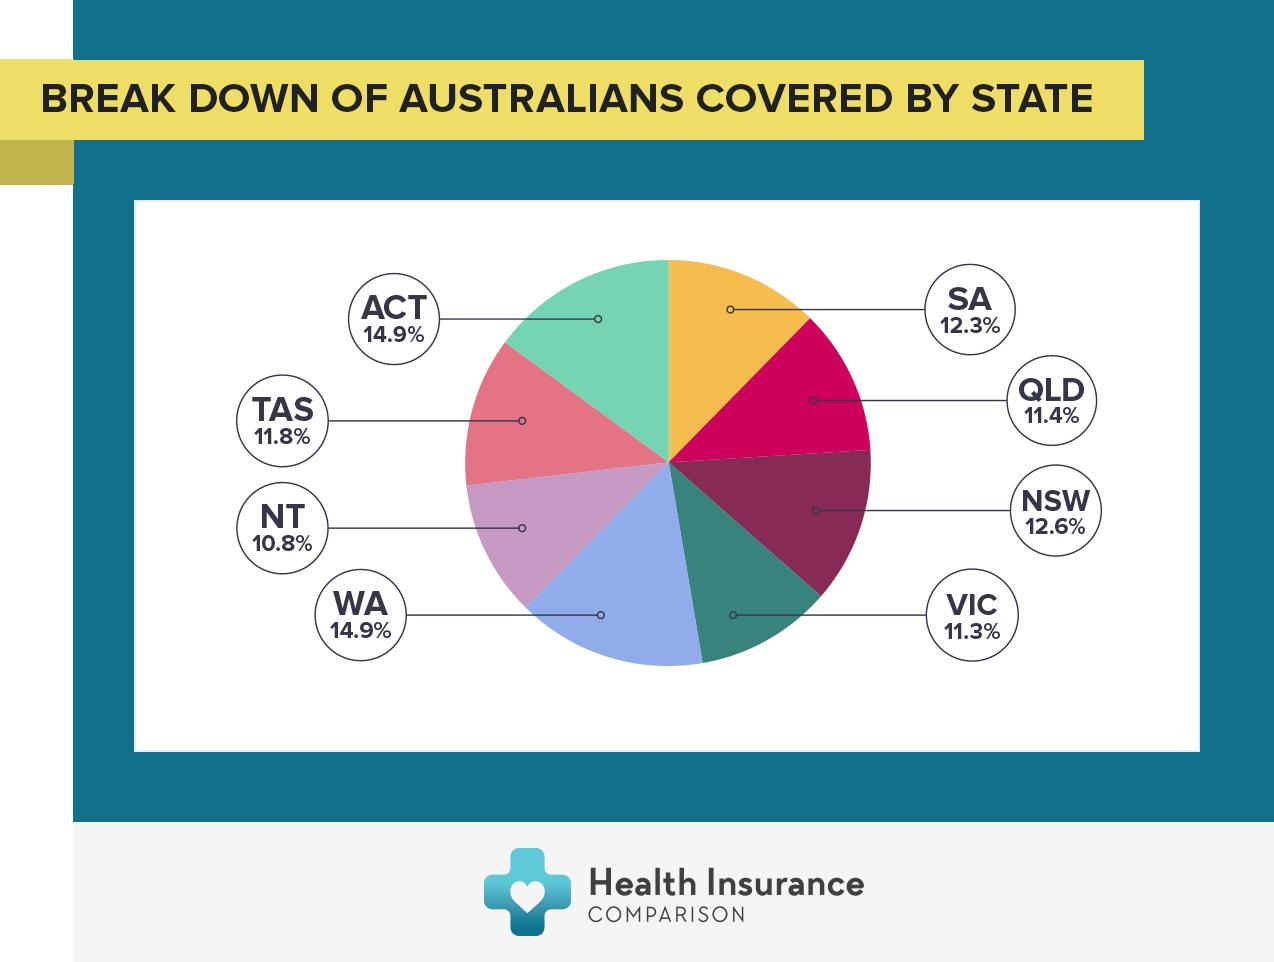 Health Insurance in South Australia | Health Insurance ...